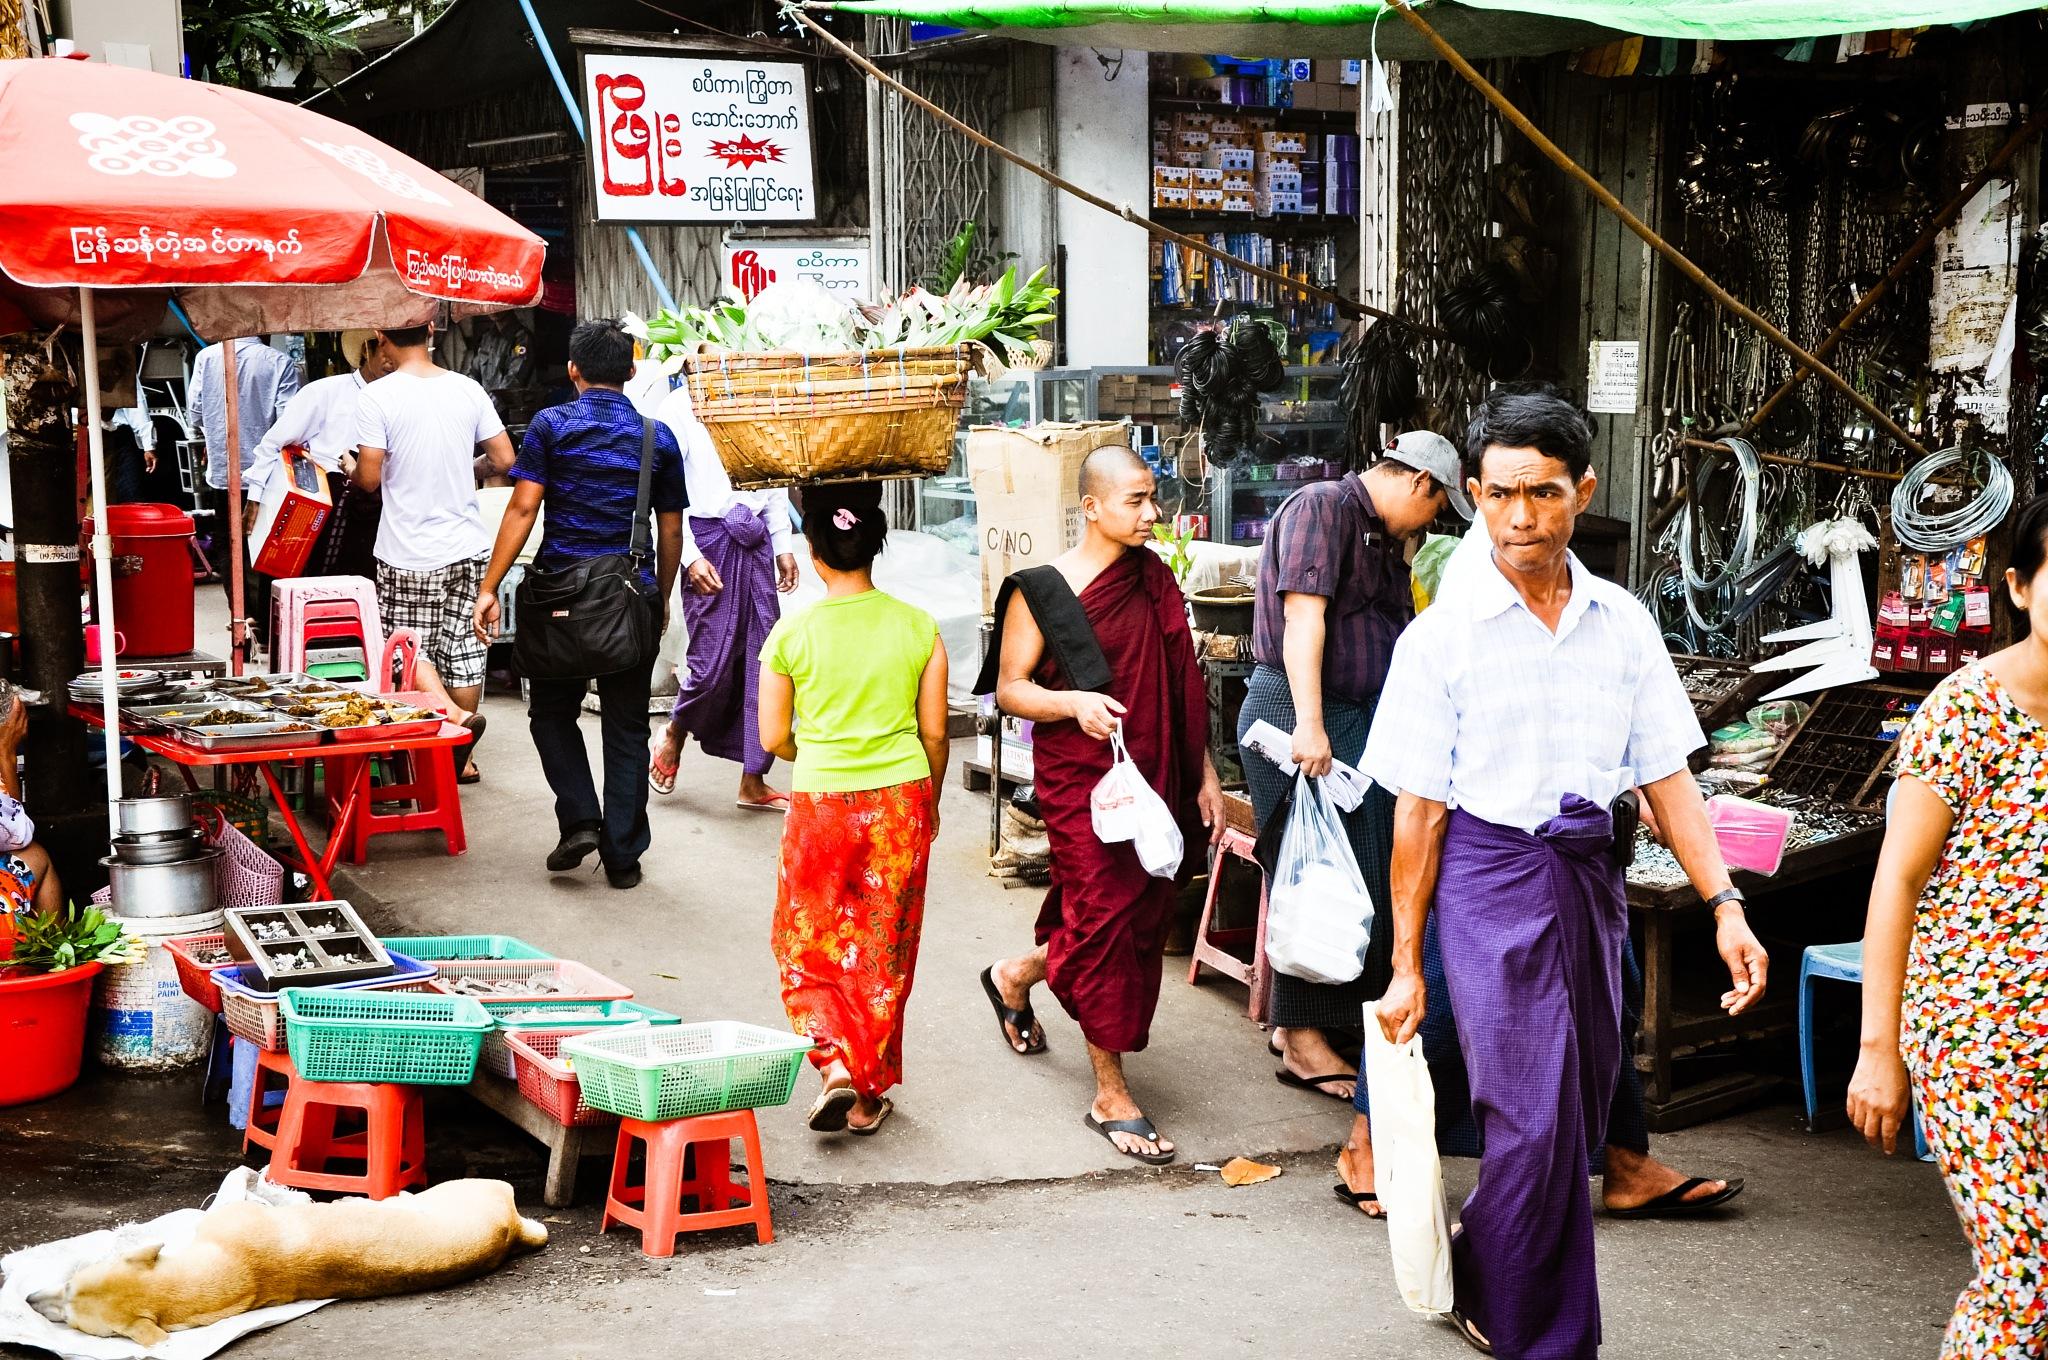 Streets of Yangon (Myanmar) by Jiri Bielicky